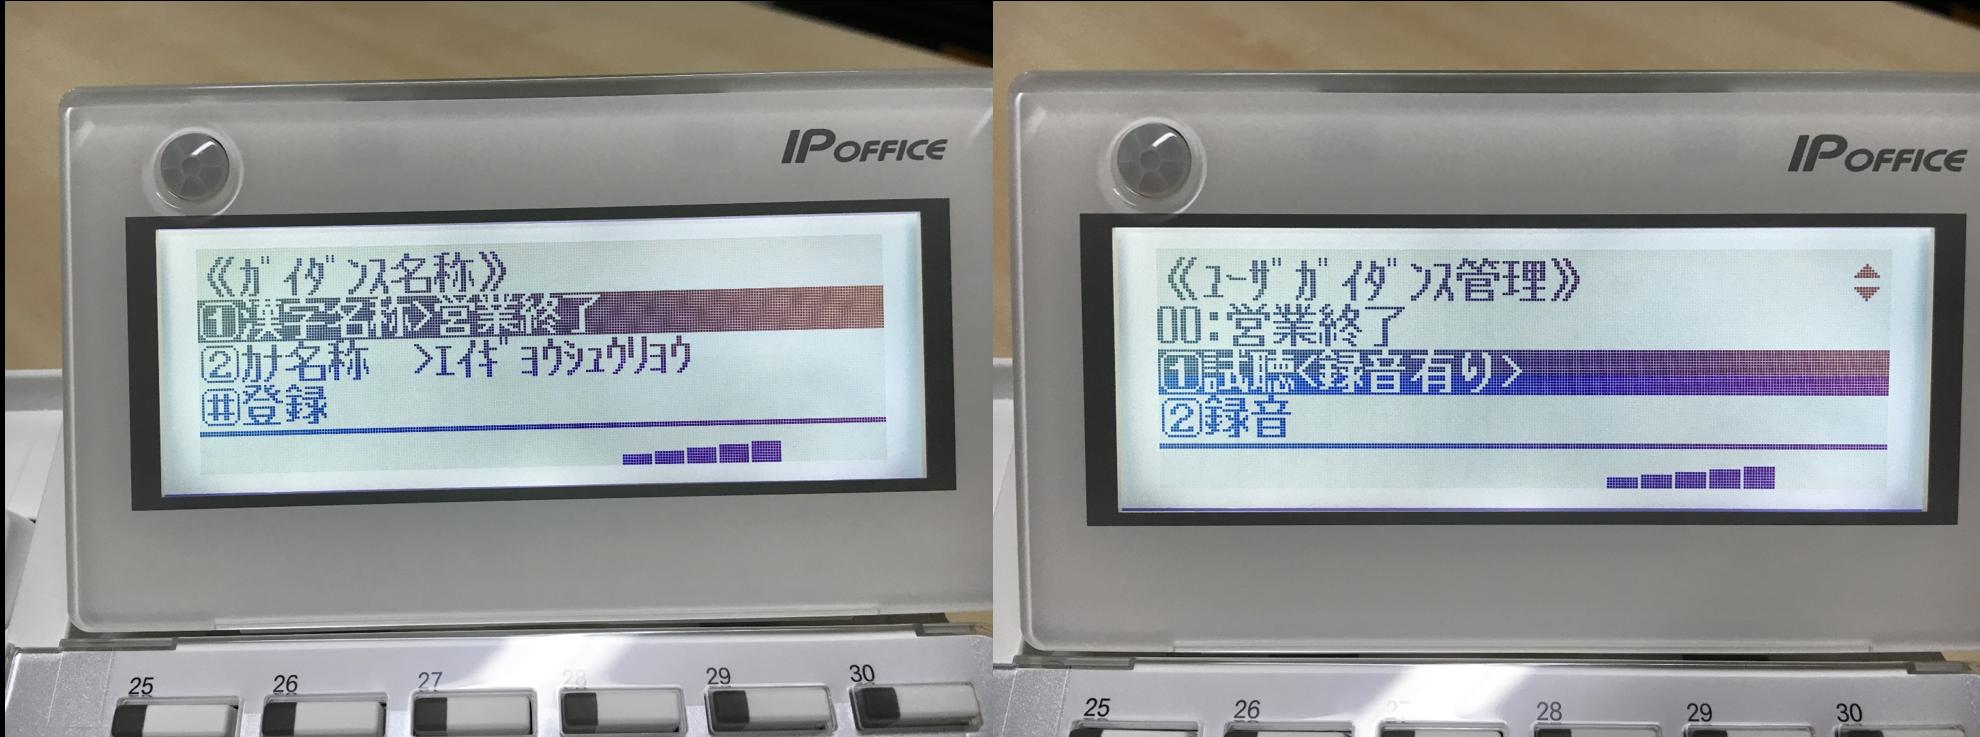 Panasonic_IP OFFICEⅡ_電話機_3